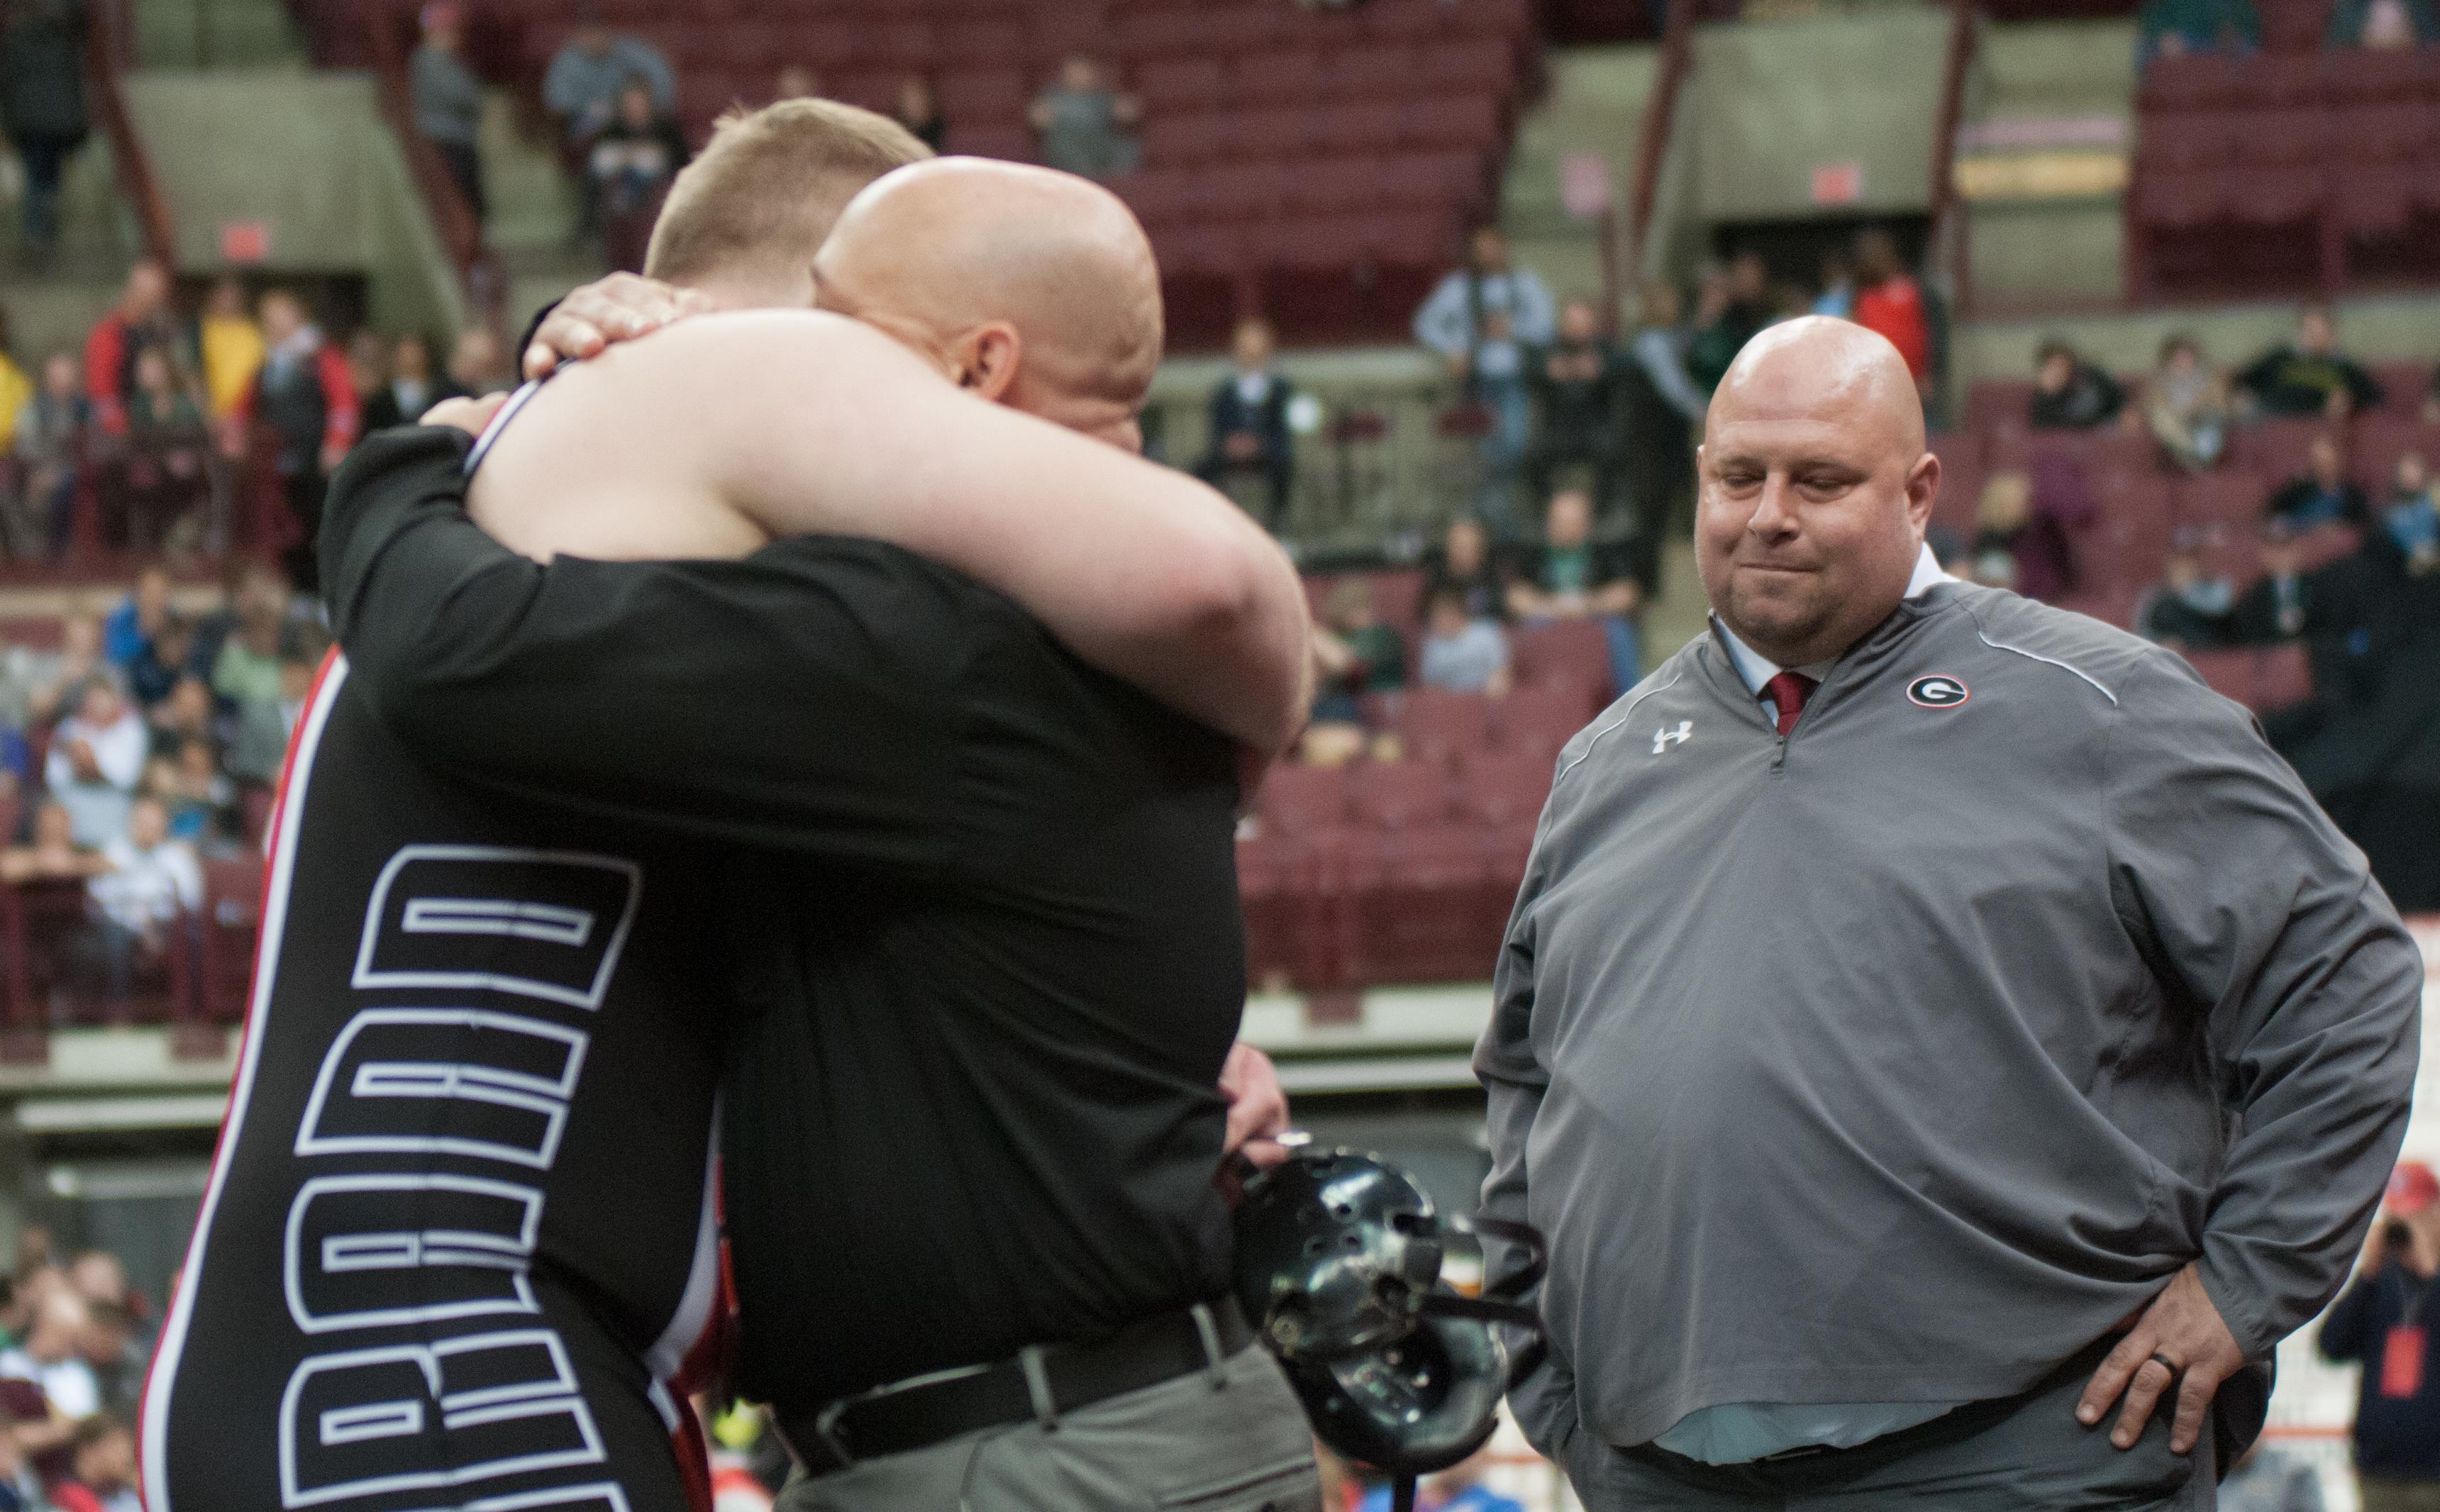 Jack Delgarbino's State Championship